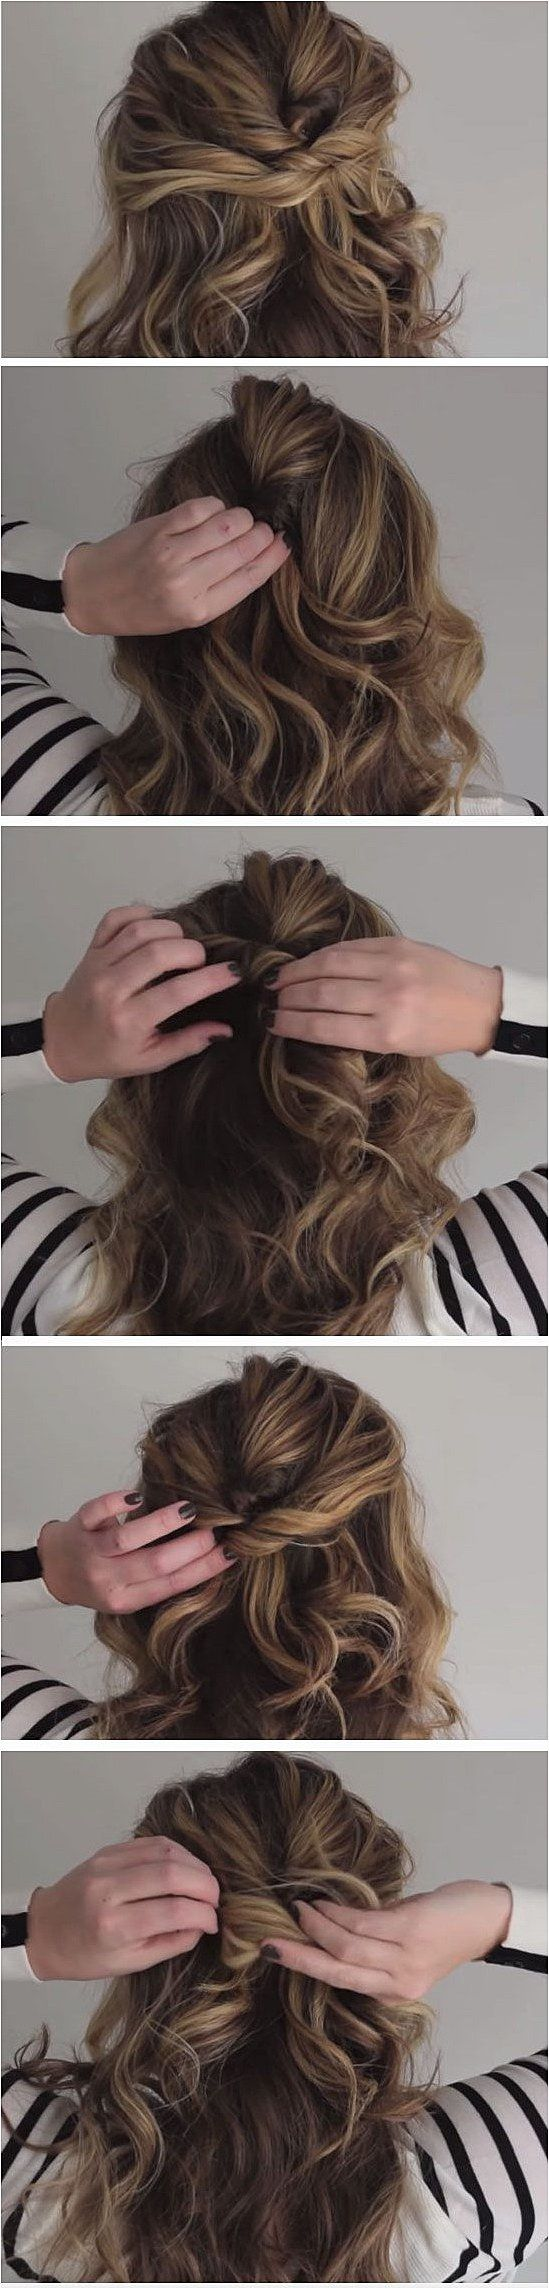 The twisted half up diy wedding hairstyles for medium hair easy